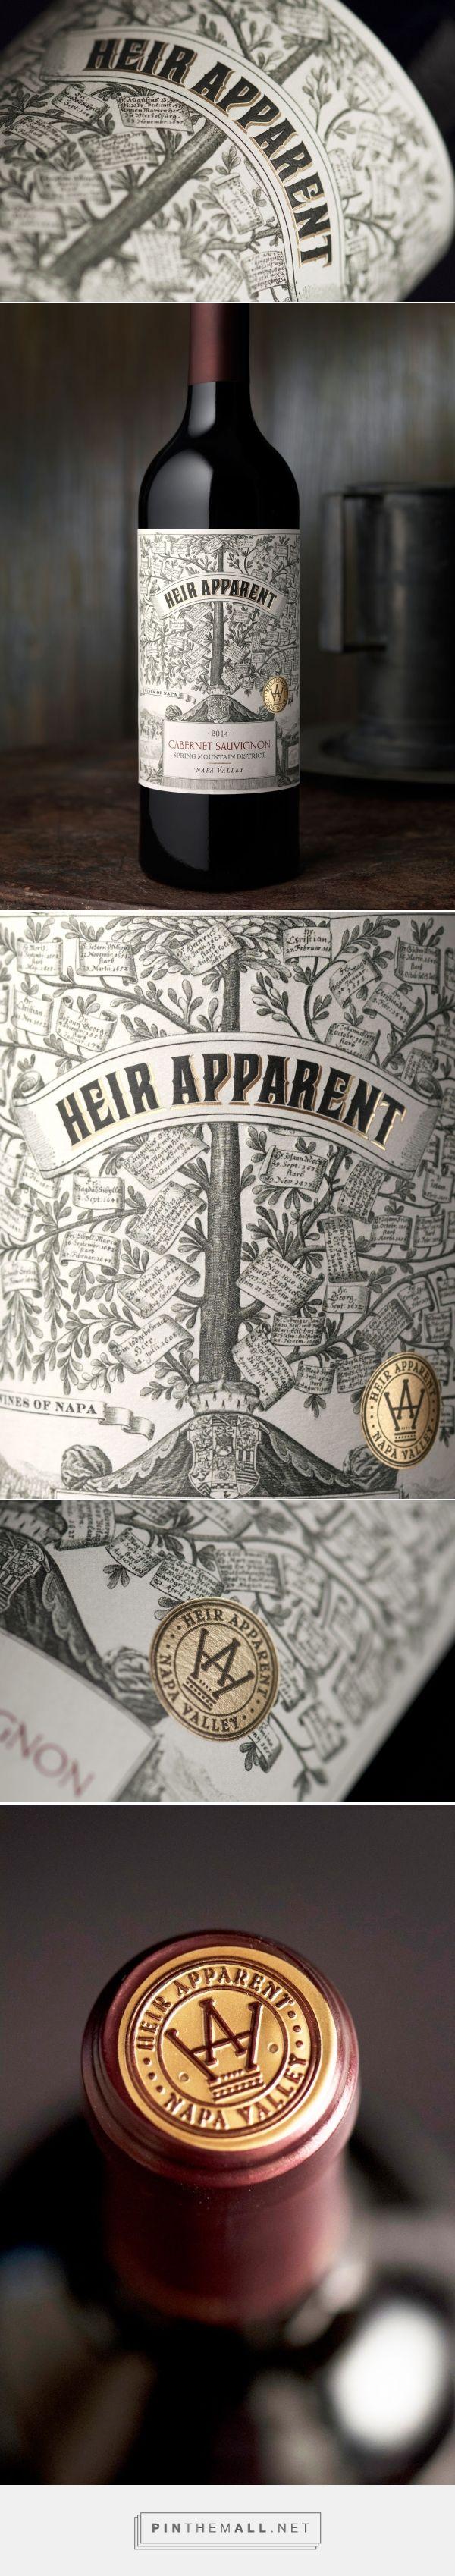 Heir Apparent wine label design by CF NAPA Brand Design - http://www.packagingoftheworld.com/2017/07/heir-apparent.html - created via https://pinthemall.net